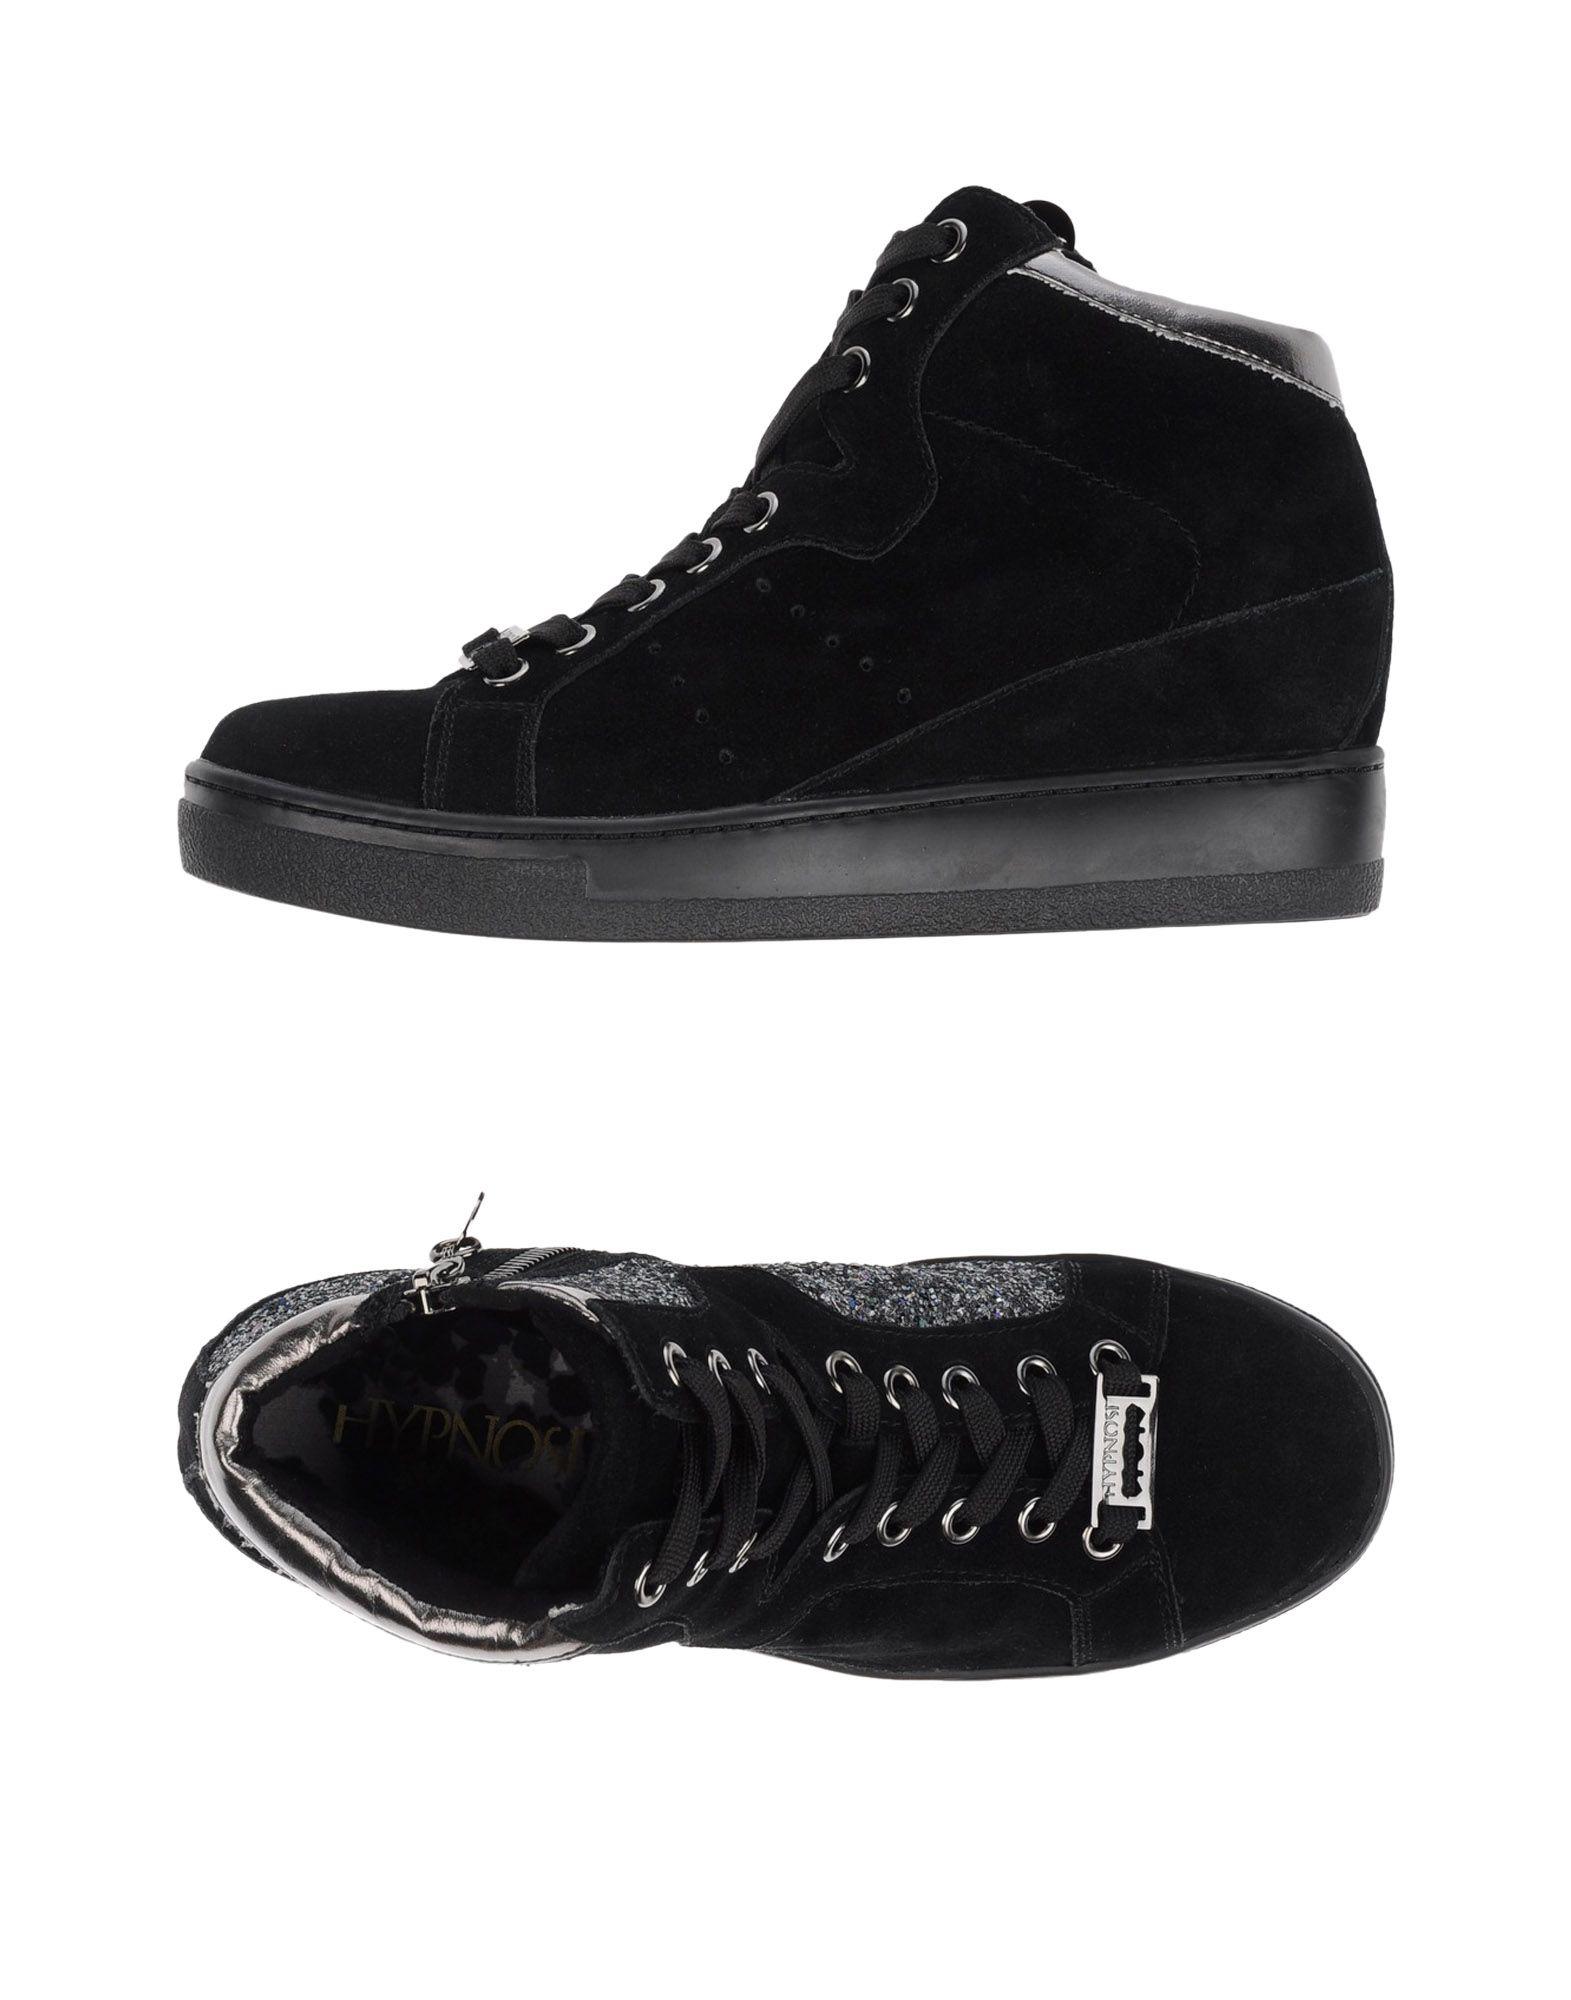 HYPNOSI Sneakers Black Women